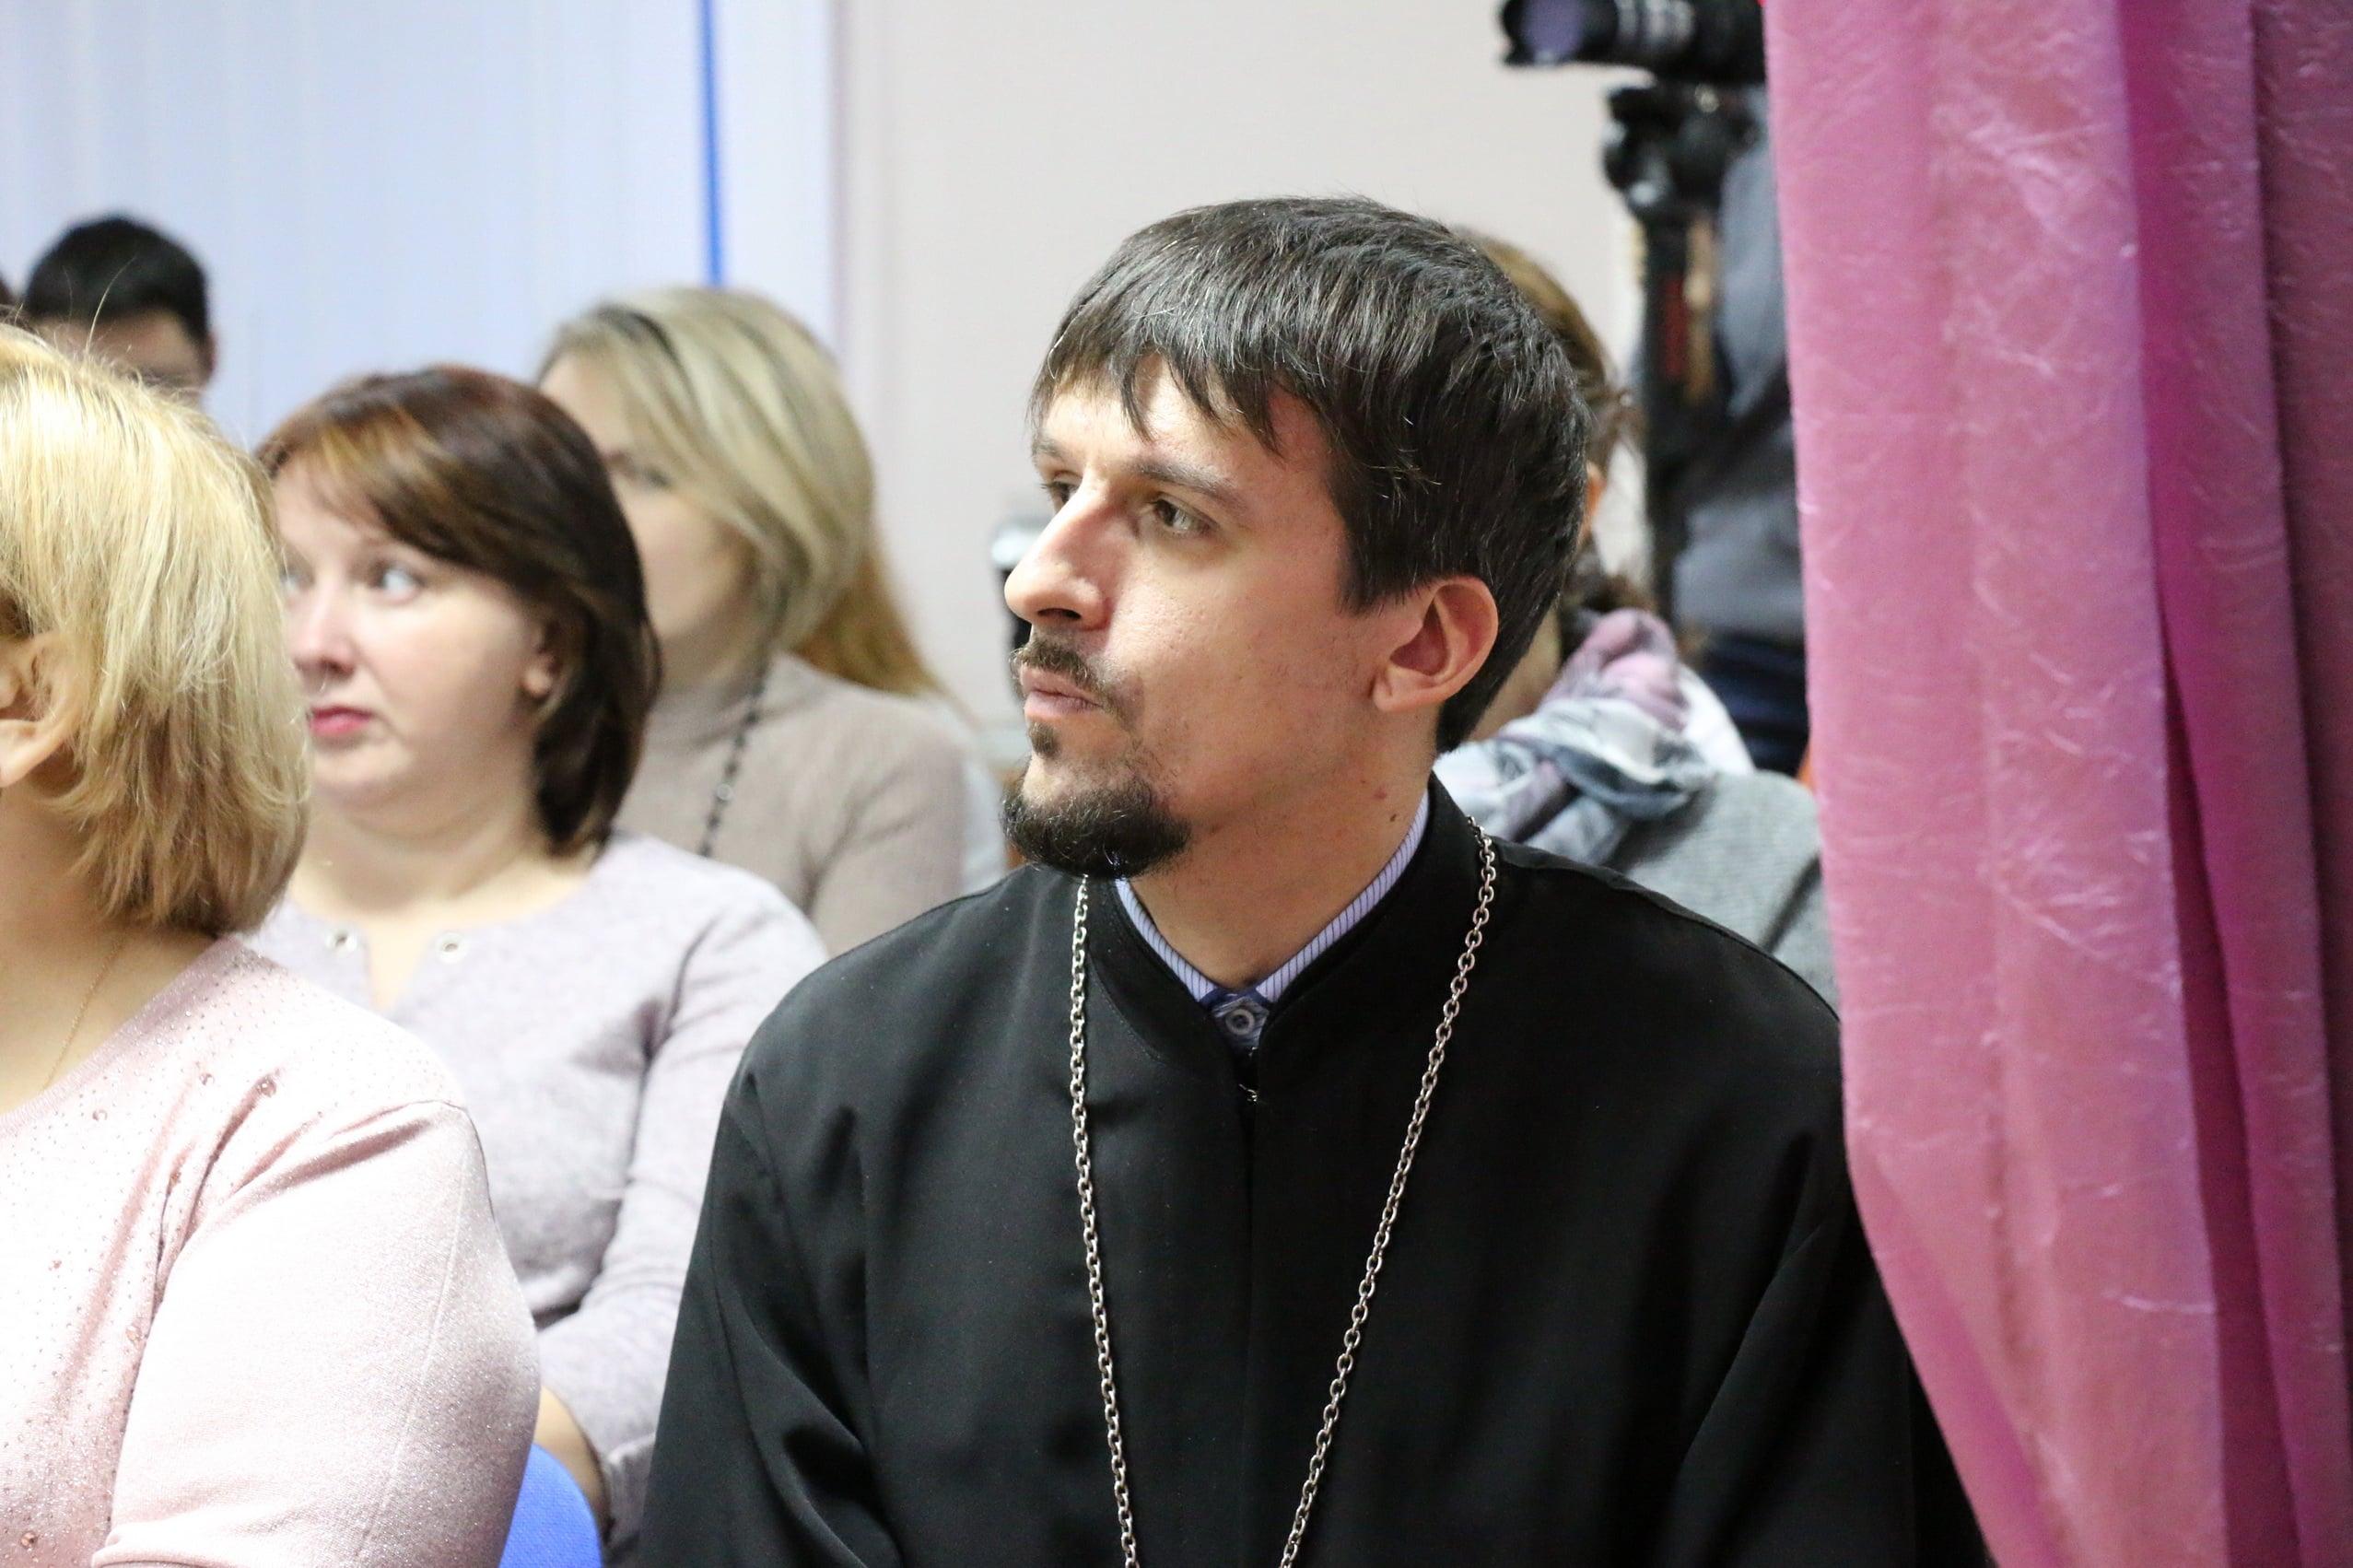 http://monuspen.ru/photoreports/06f1f0951a3799a9c804c7f0881a7677.JPG